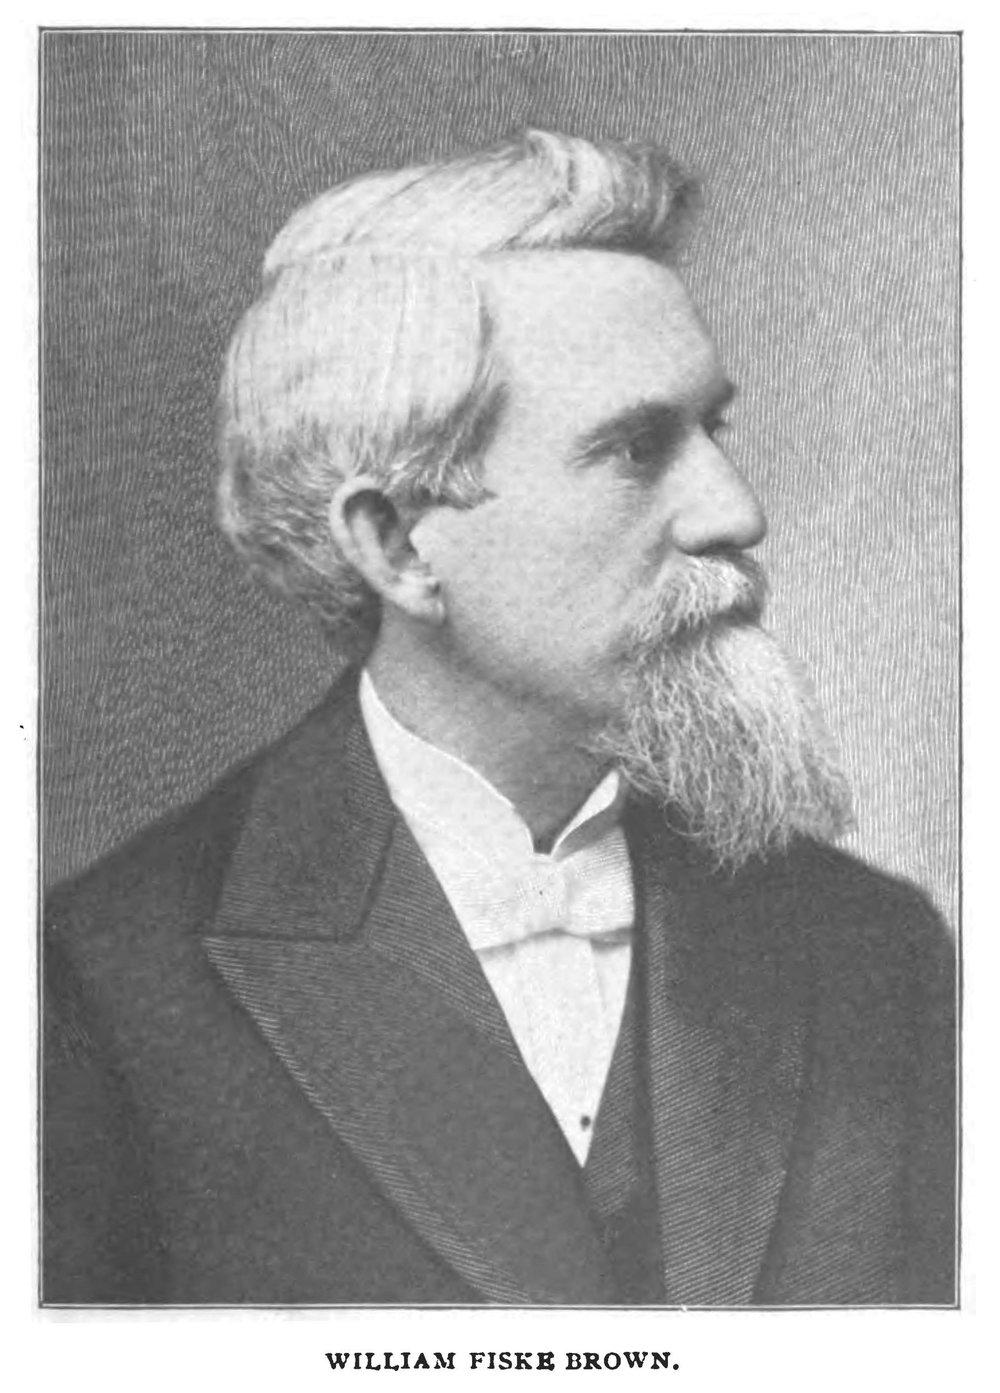 Brown, William Fiske photo 3.jpg